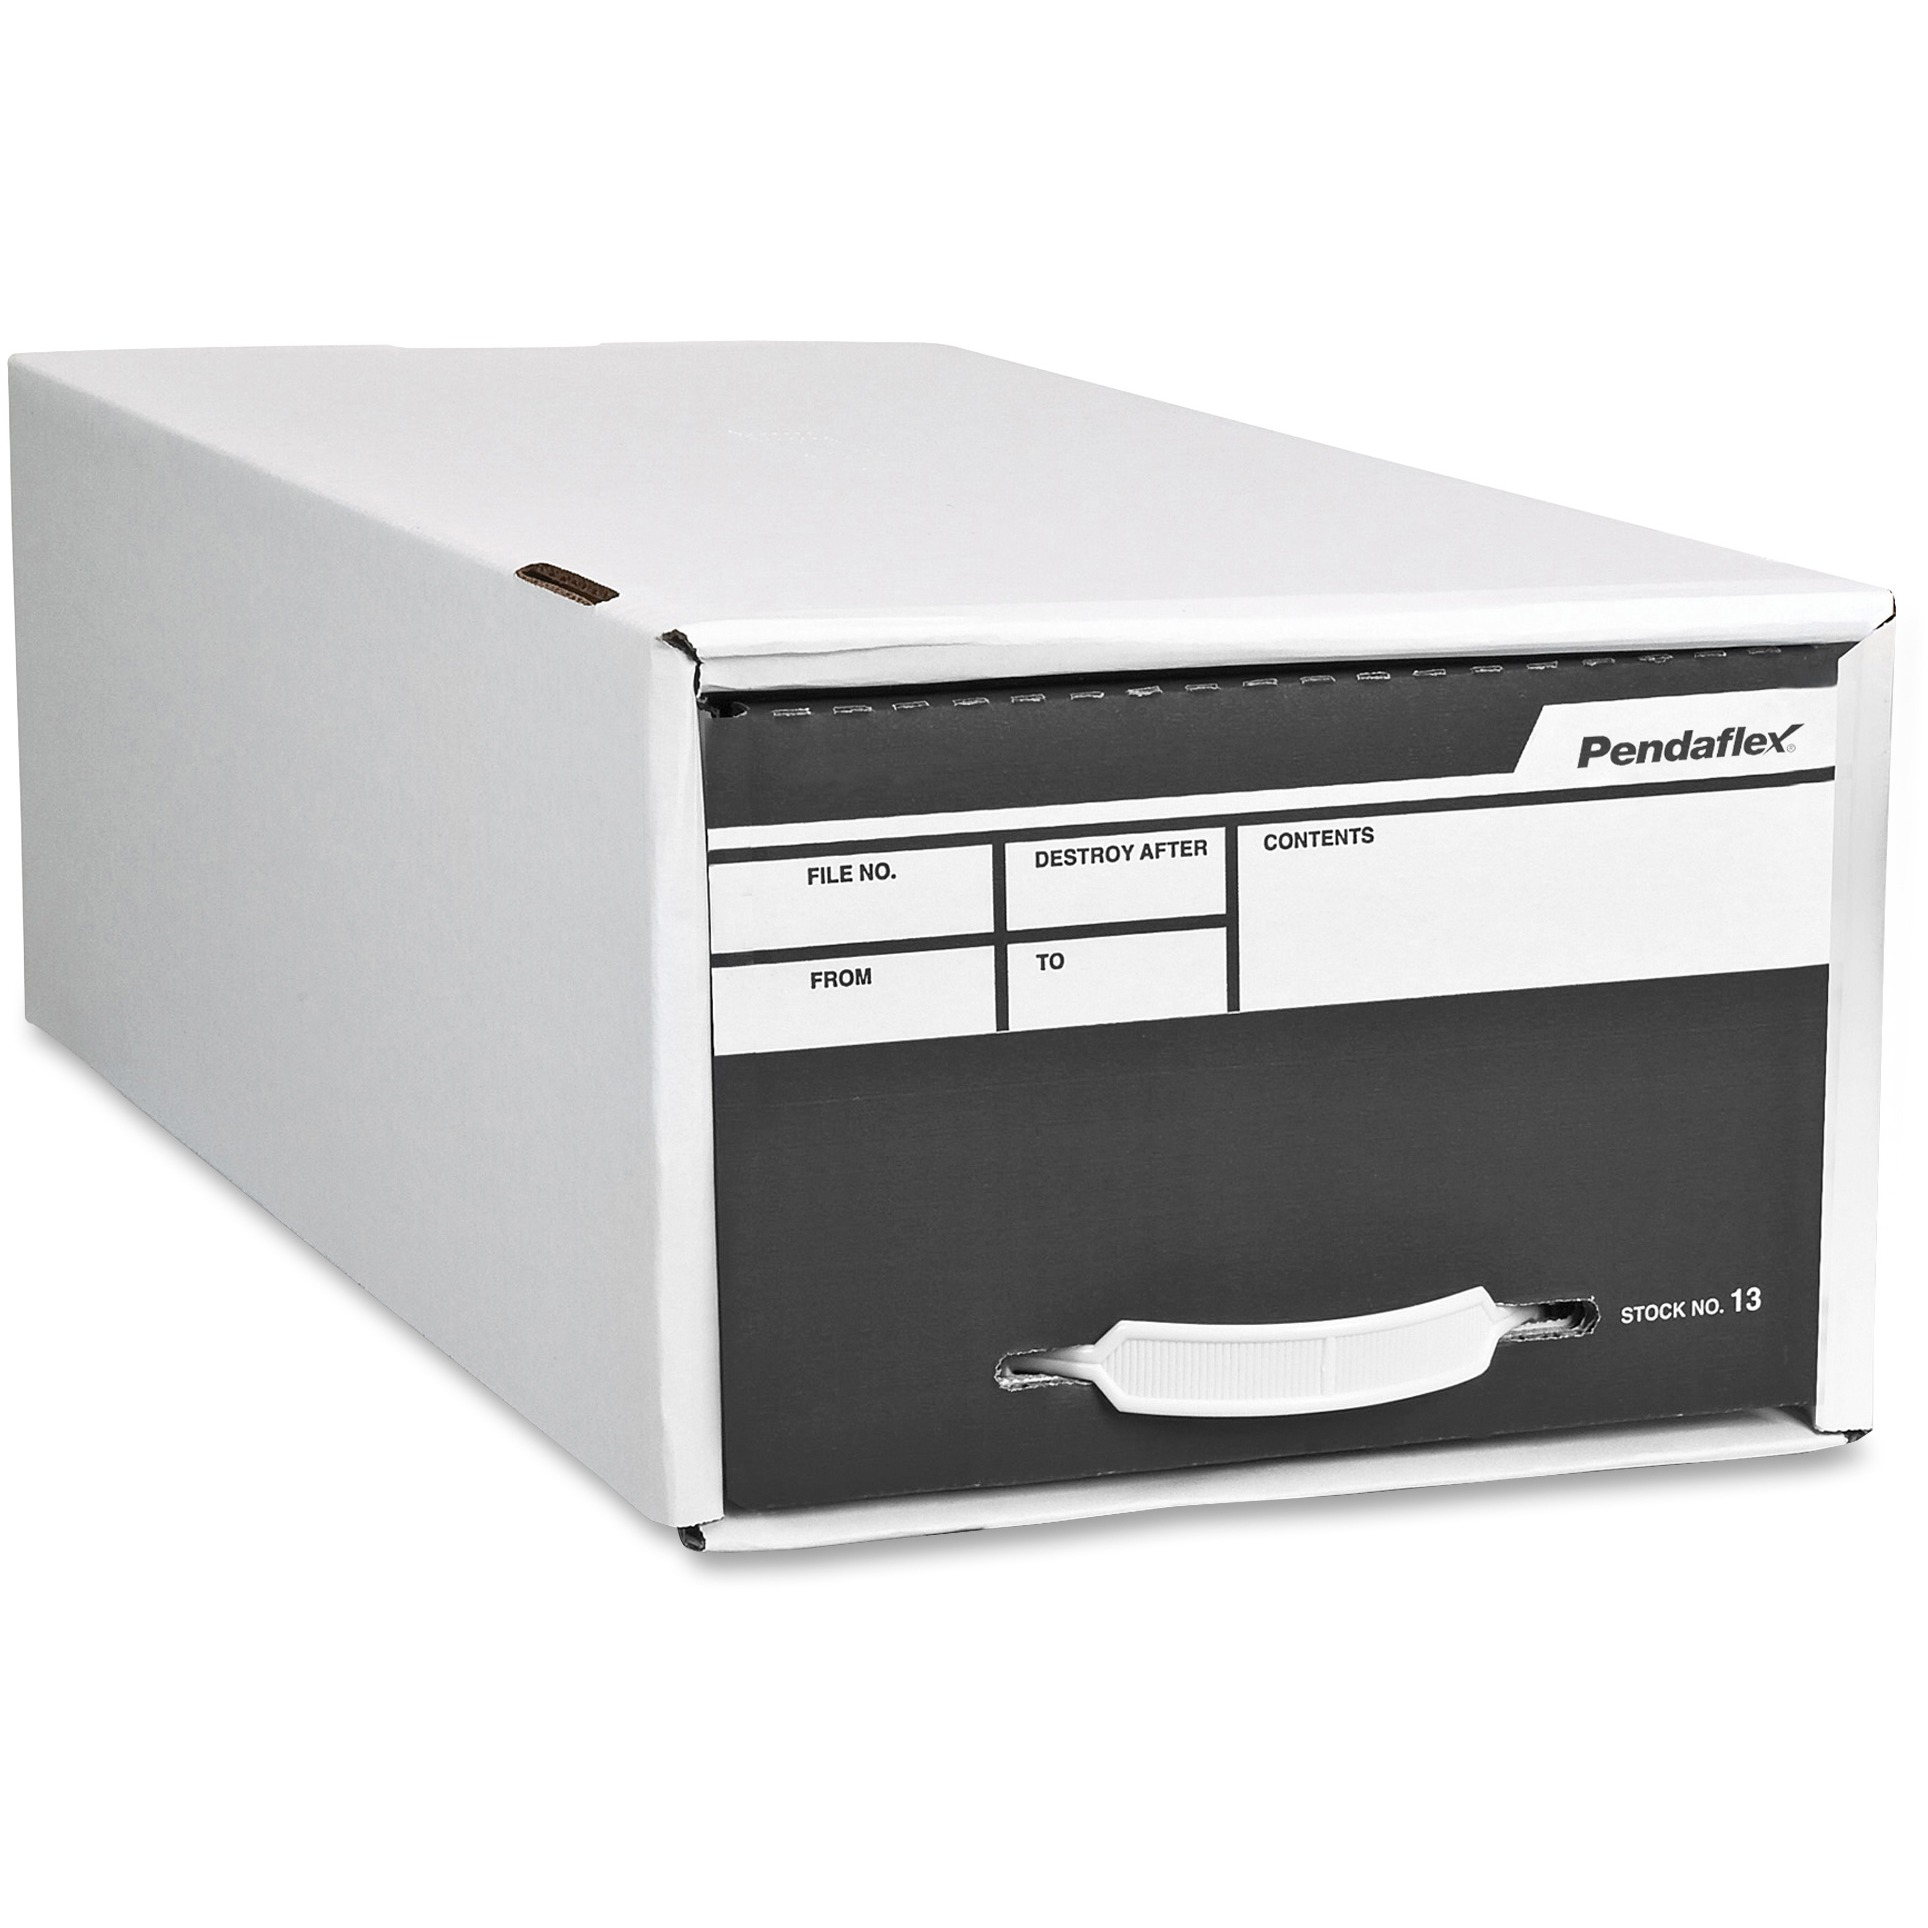 Pendaflex Standard Storage File Boxes, White, 1 Each (Quantity)